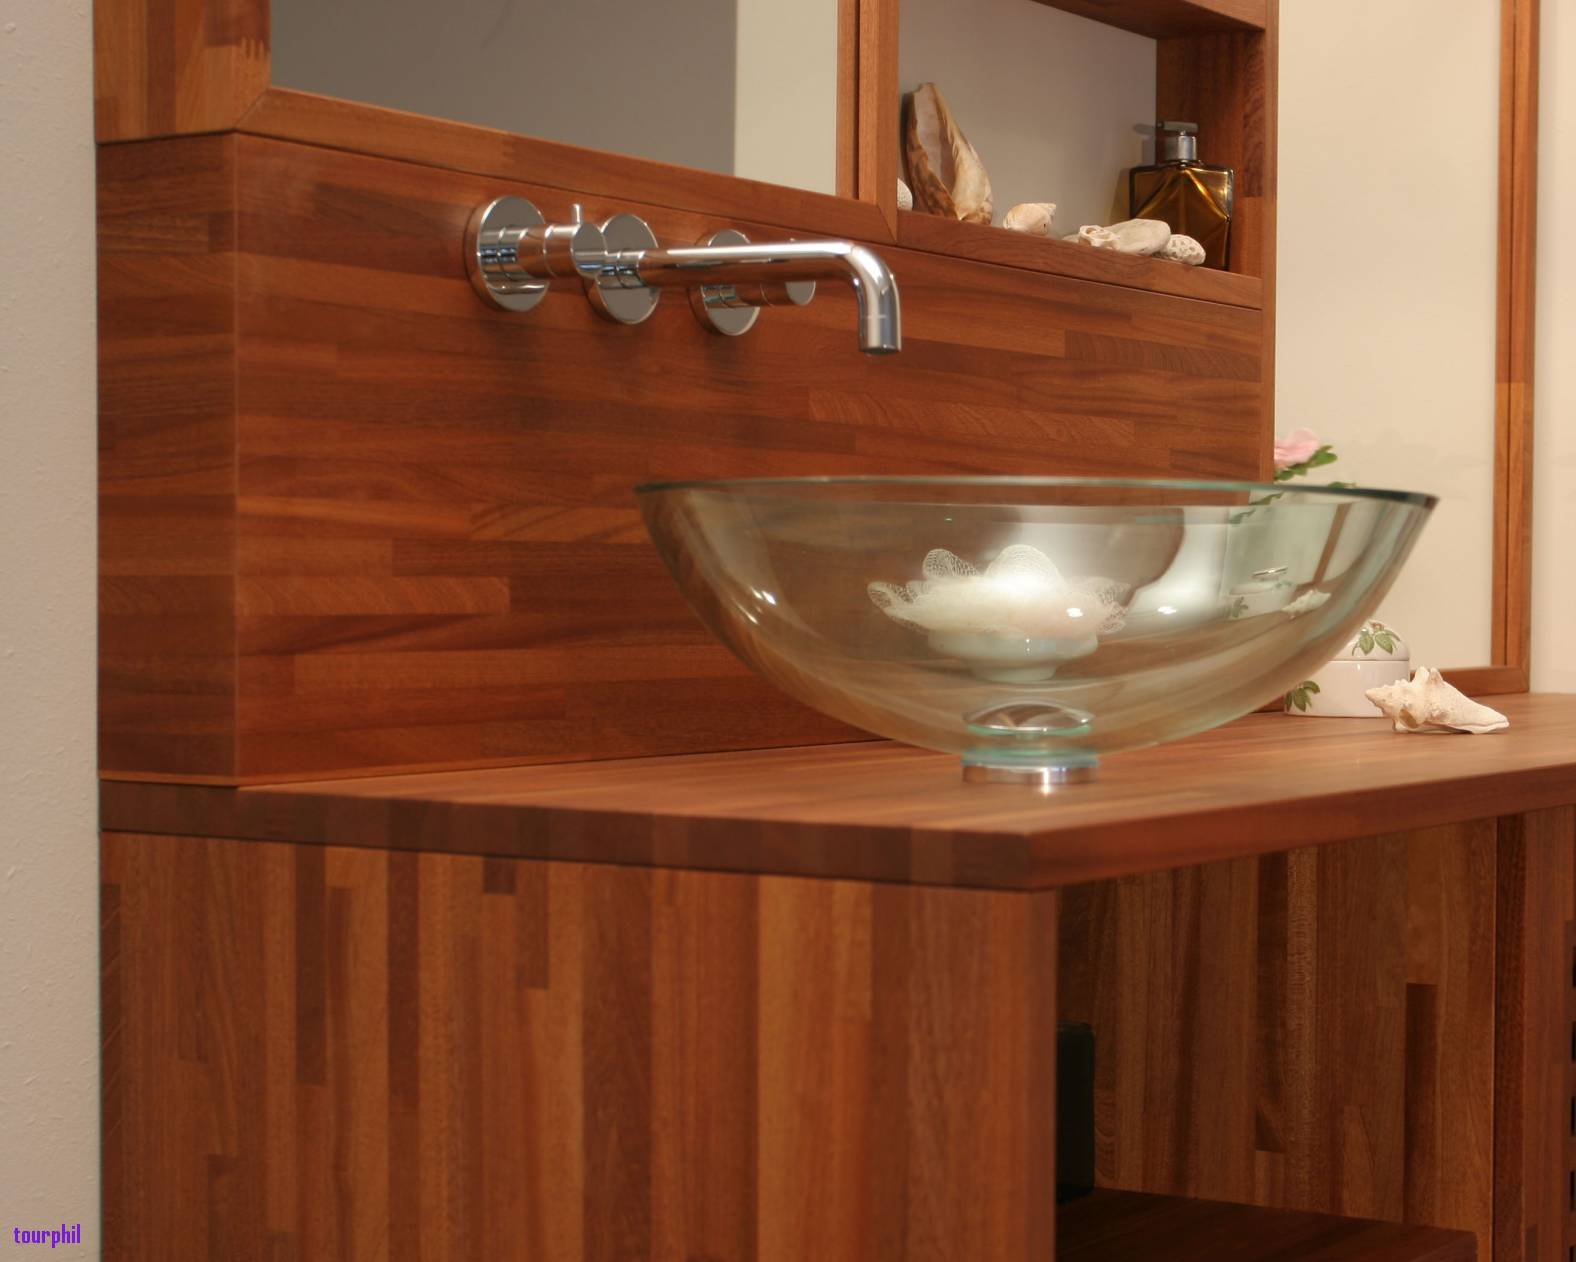 Credence bois salle de bain id e pour cuisine - Credence salle de bain ikea ...